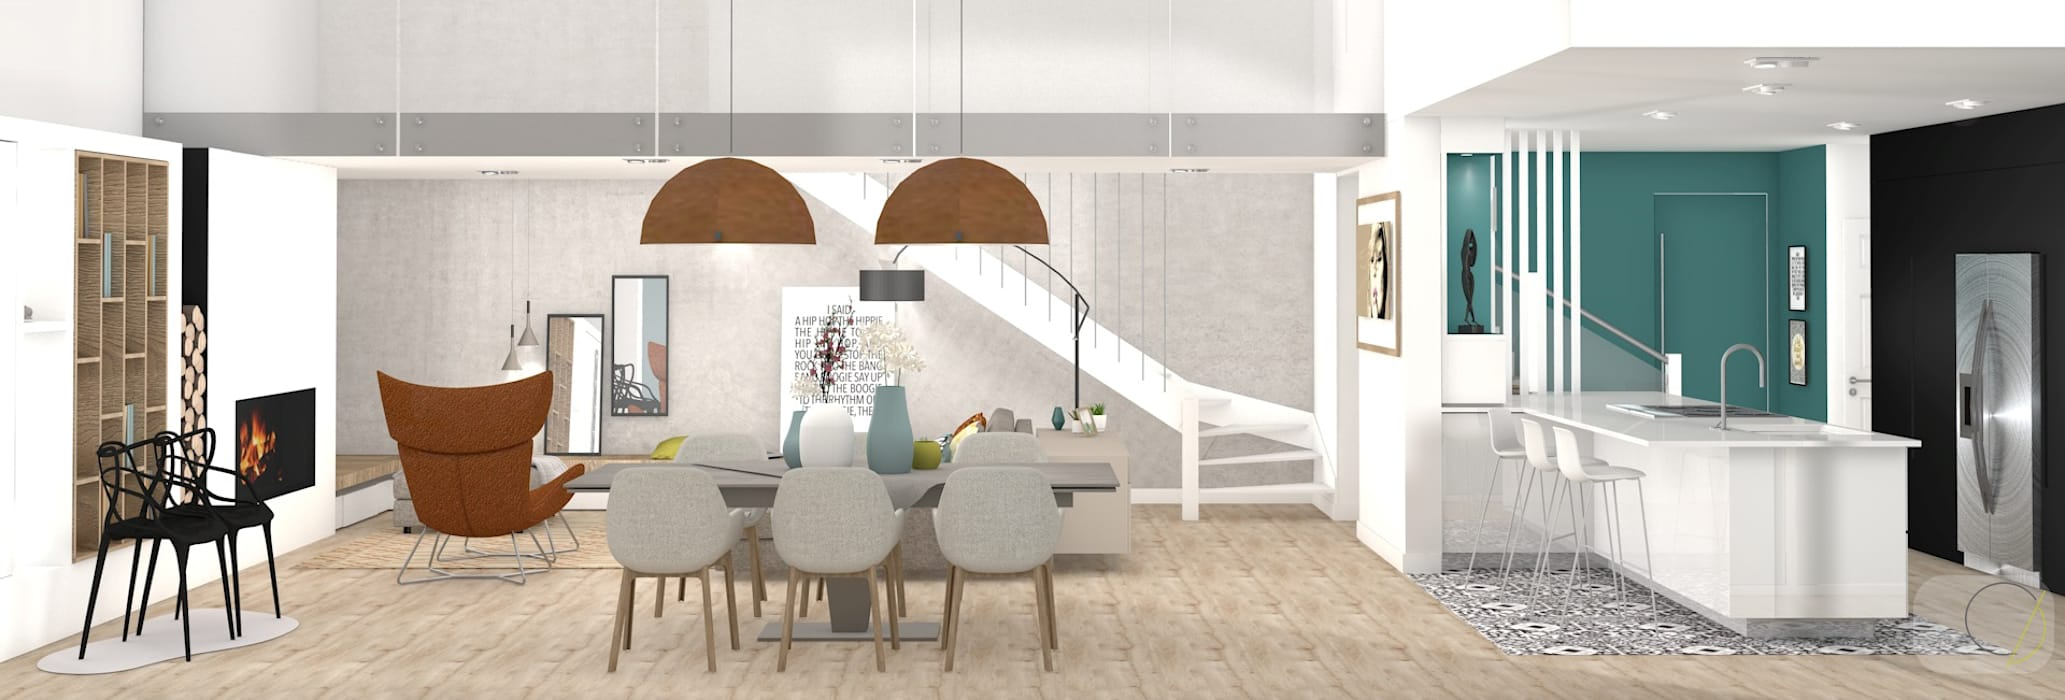 Camille BASSE, Architecte d'intérieur Modern Dining Room